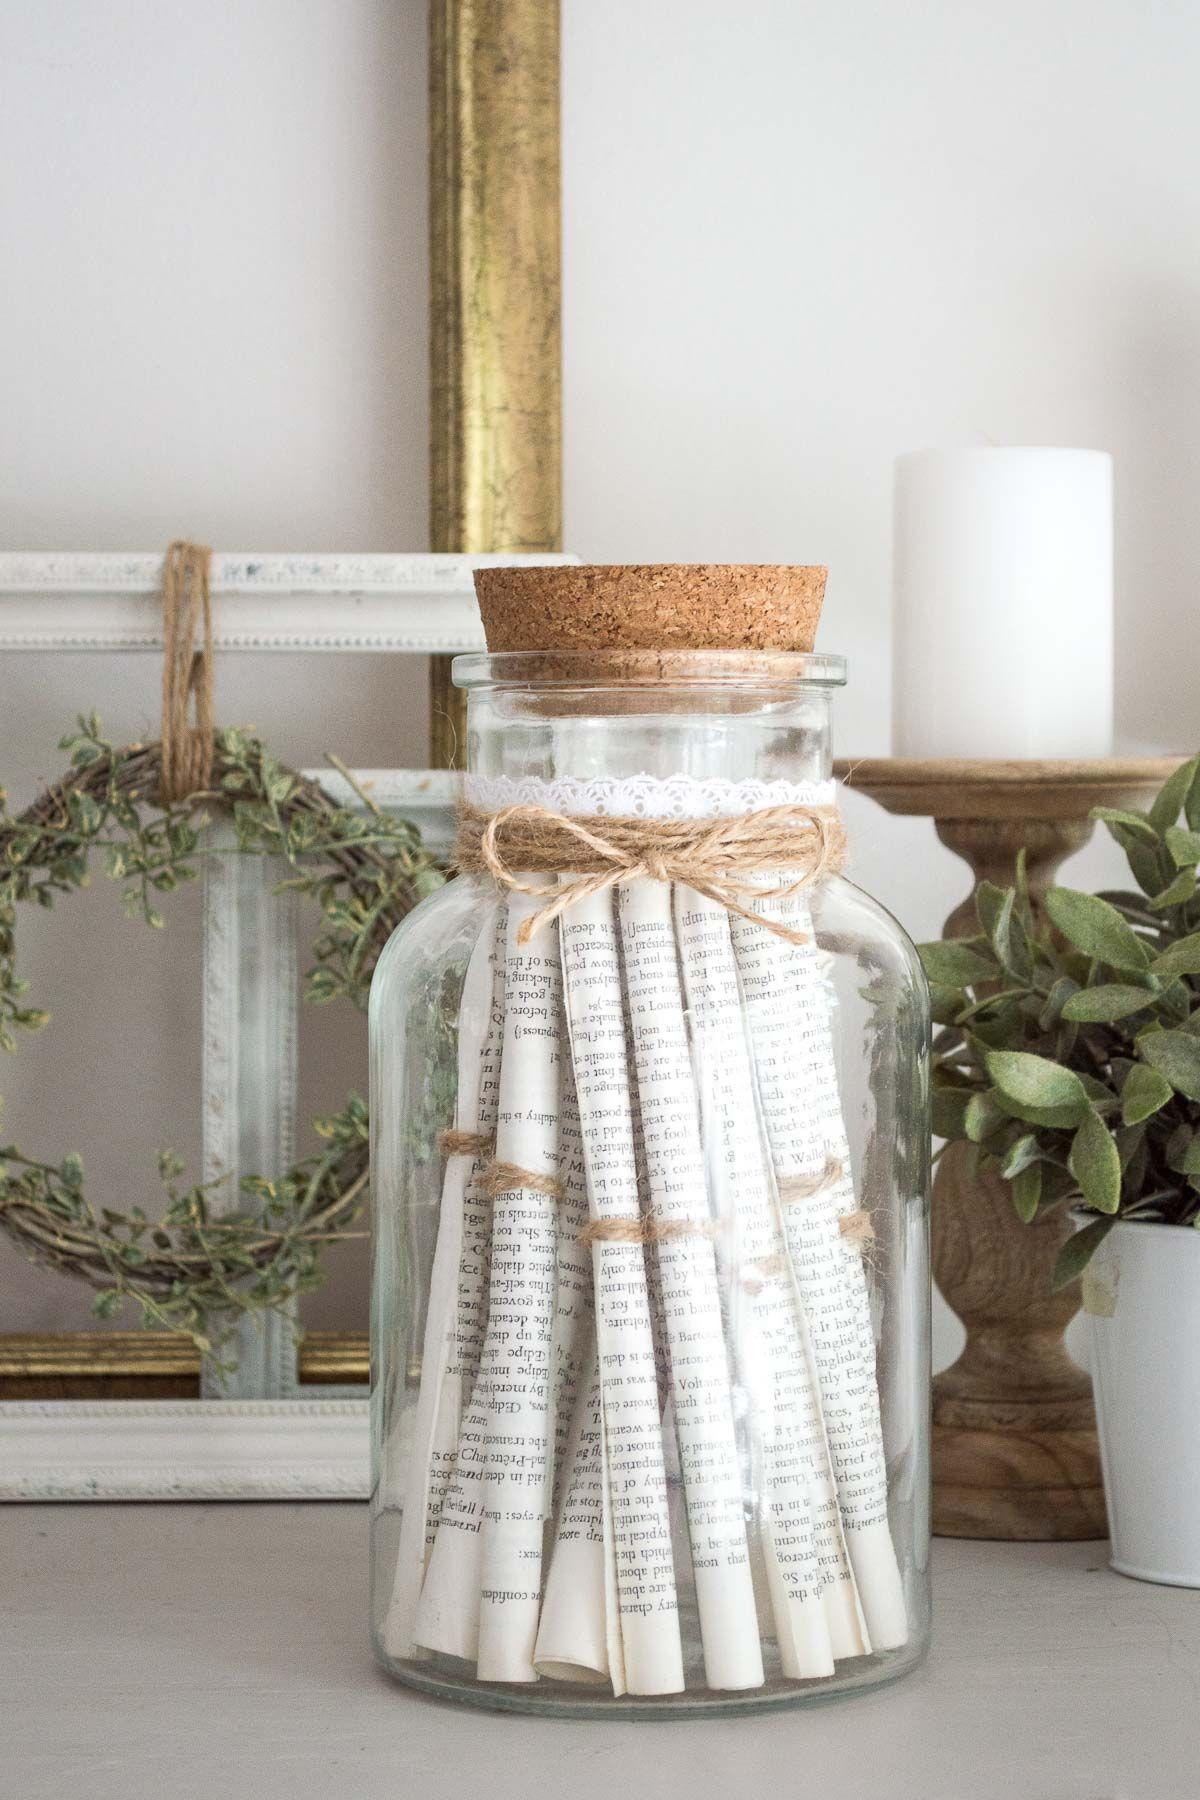 DIY vintage-style rolled paper jar - in 20 minutes or less! images